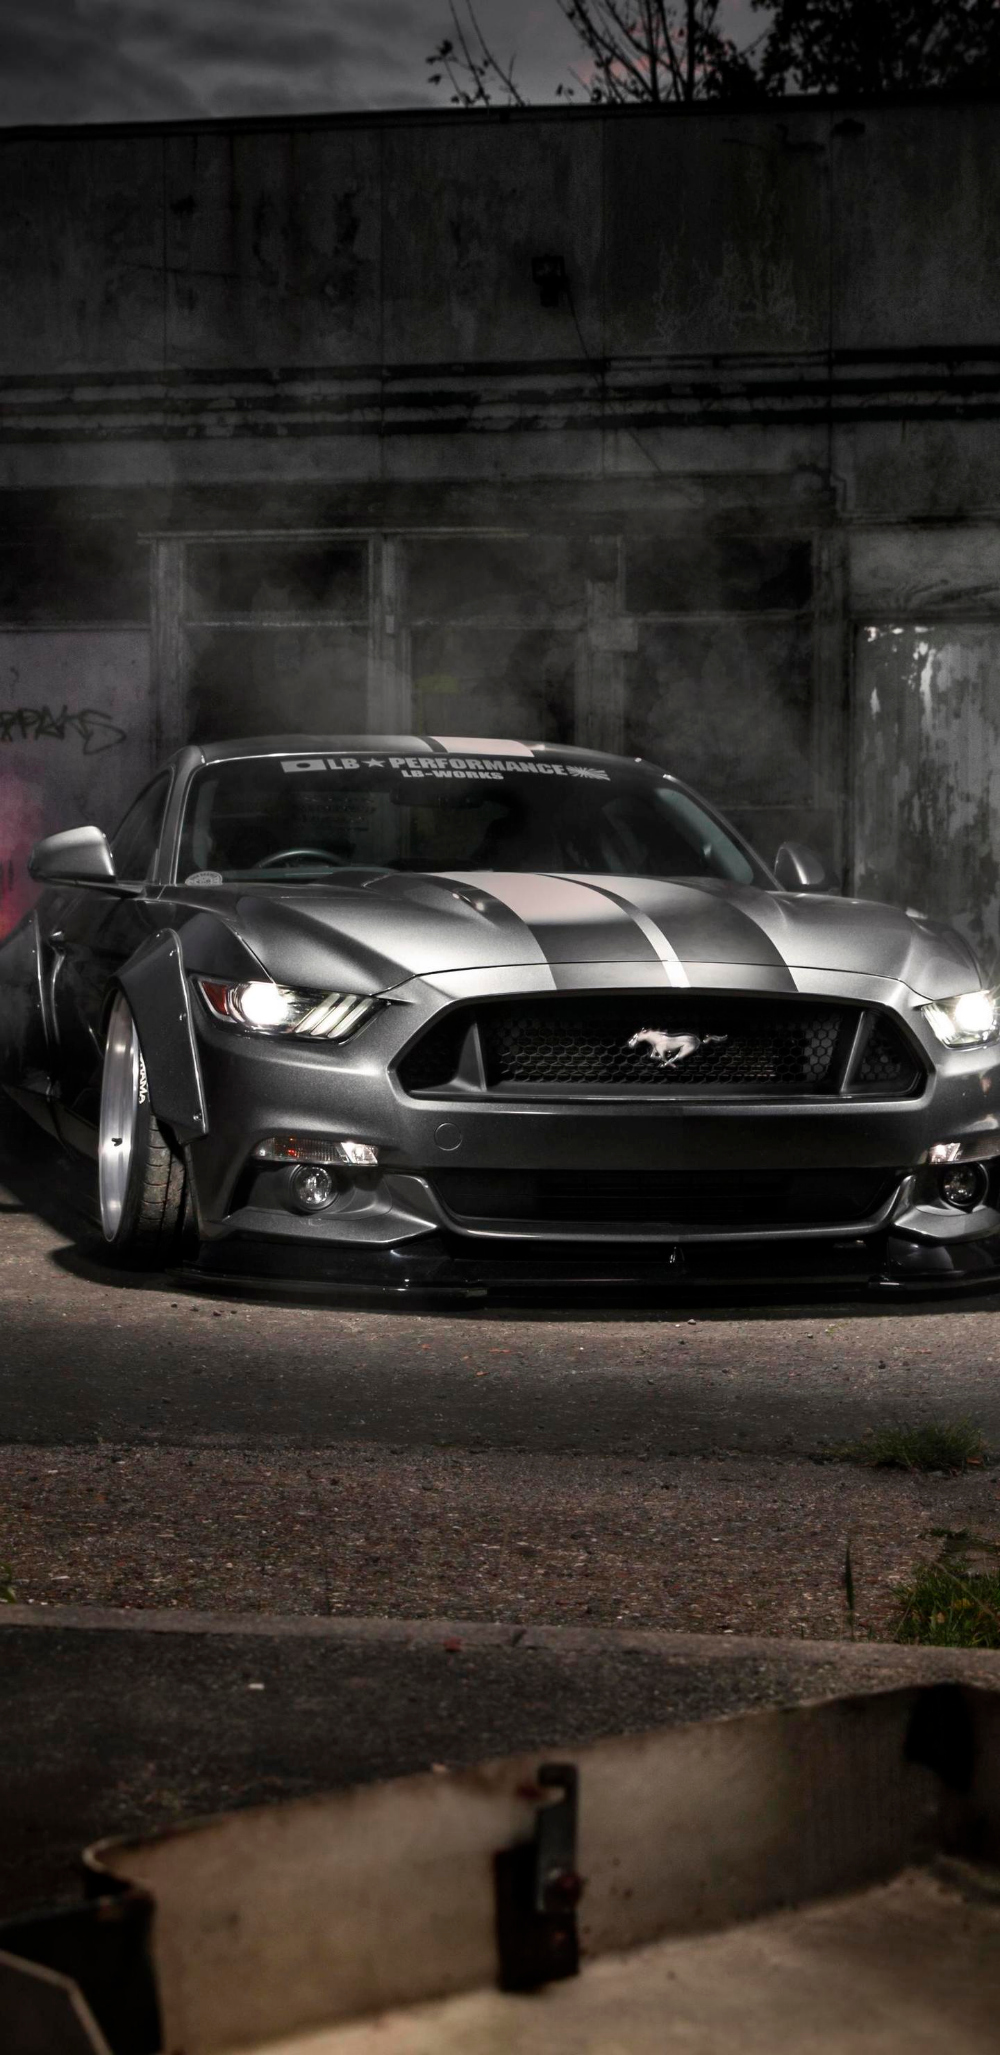 Custom Mustang Mustang Wallpaper Mustang Cars Ford Mustang Wallpaper